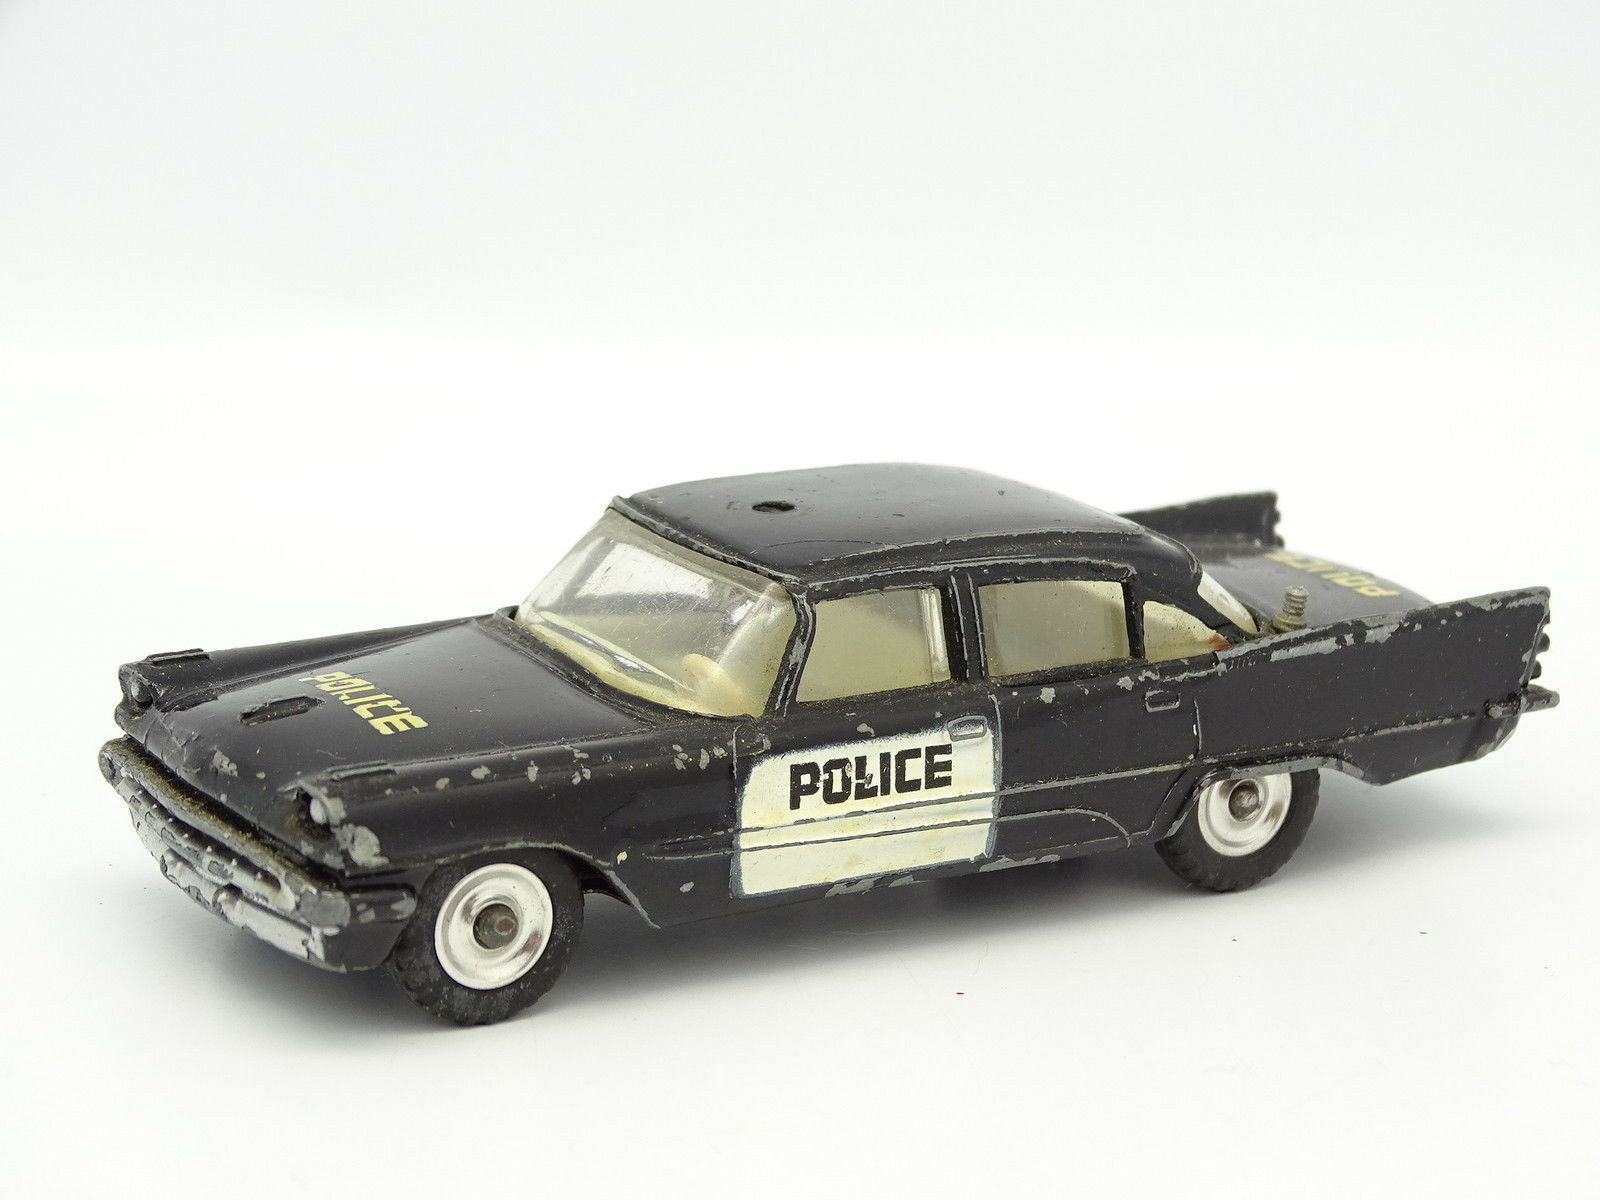 Dinky toys GB SB 1 1 1 43 - Soto Fireflite Polizia f1e1e0